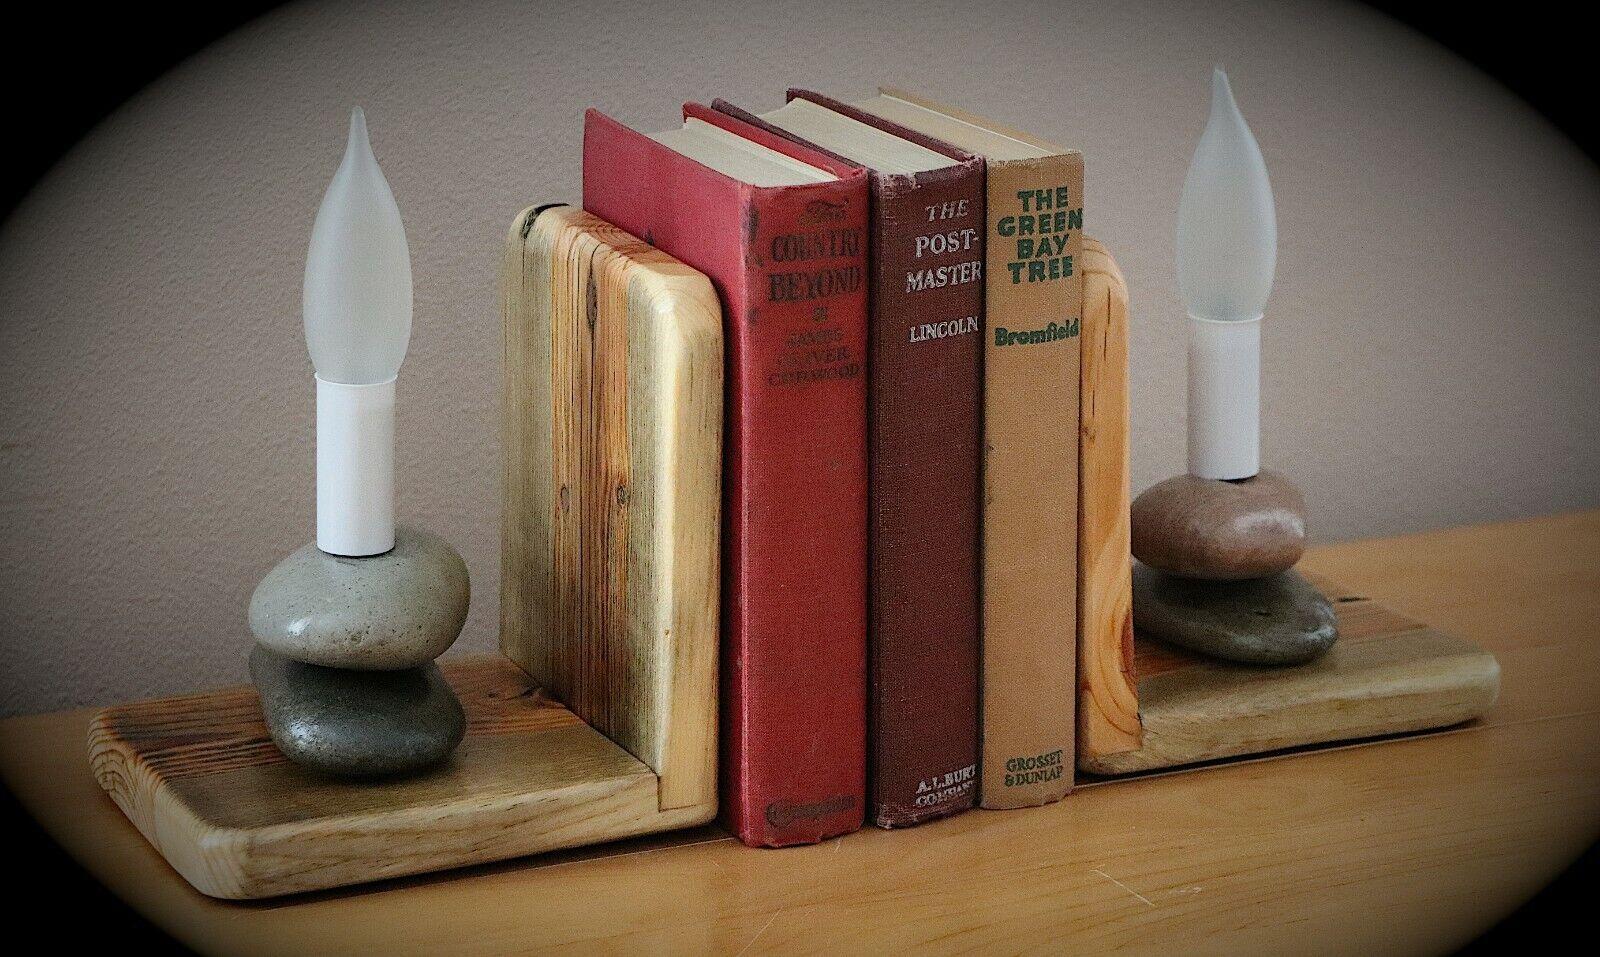 Rustic Stone Lamp Book Ends Cabin Lodge Southwestern Country Farmhouse Decor